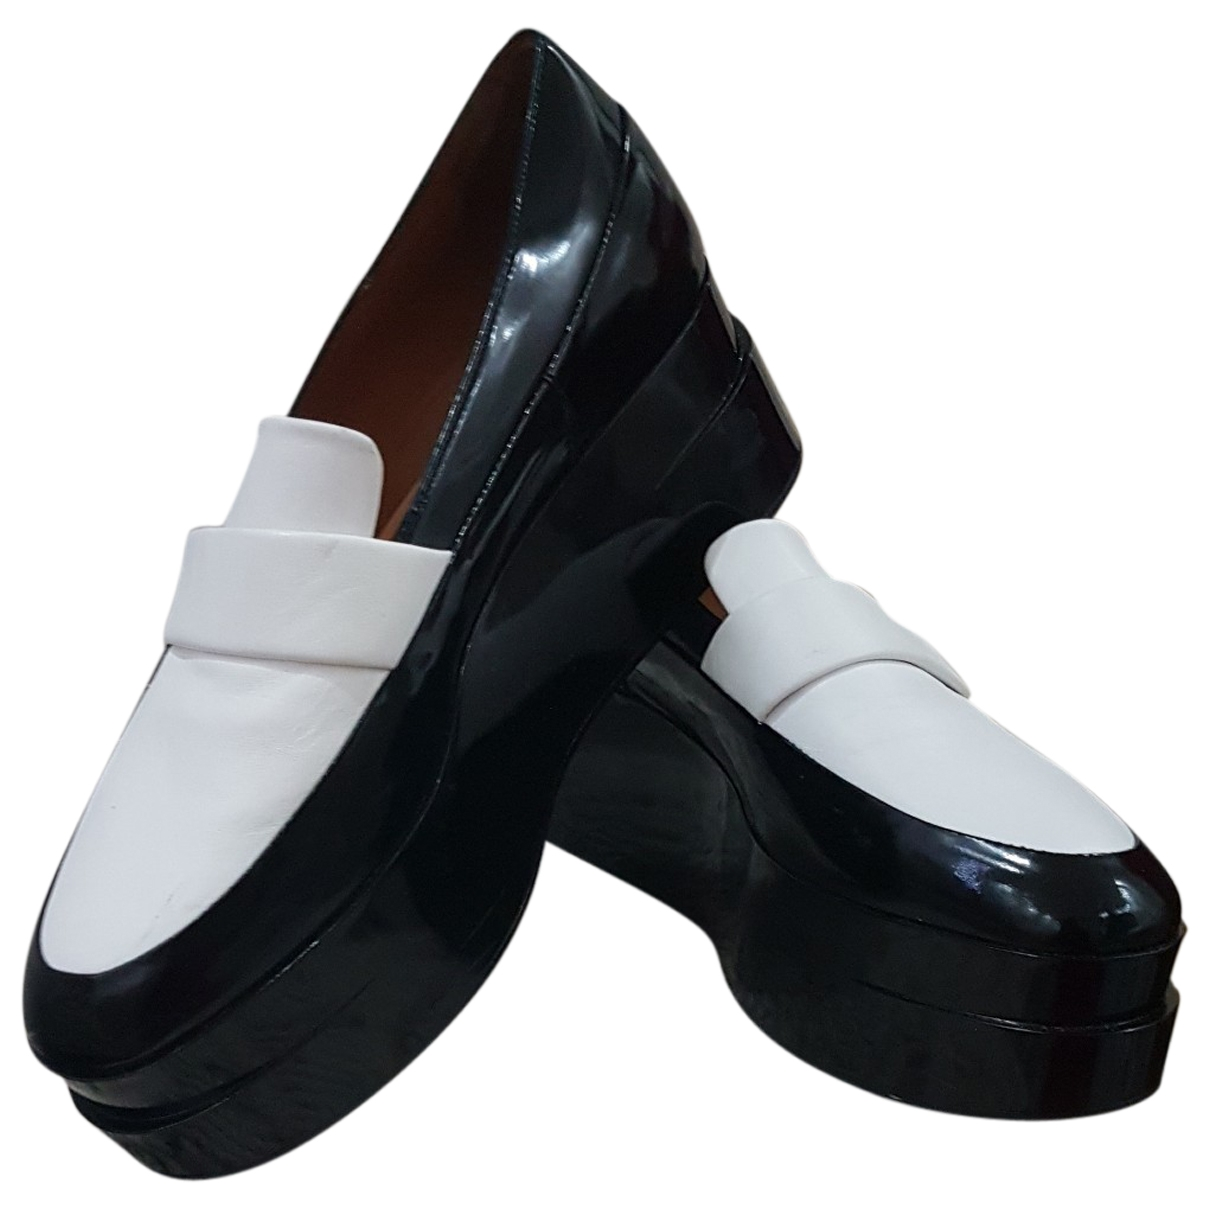 Robert Clergerie \N Black Leather Flats for Women 38 EU